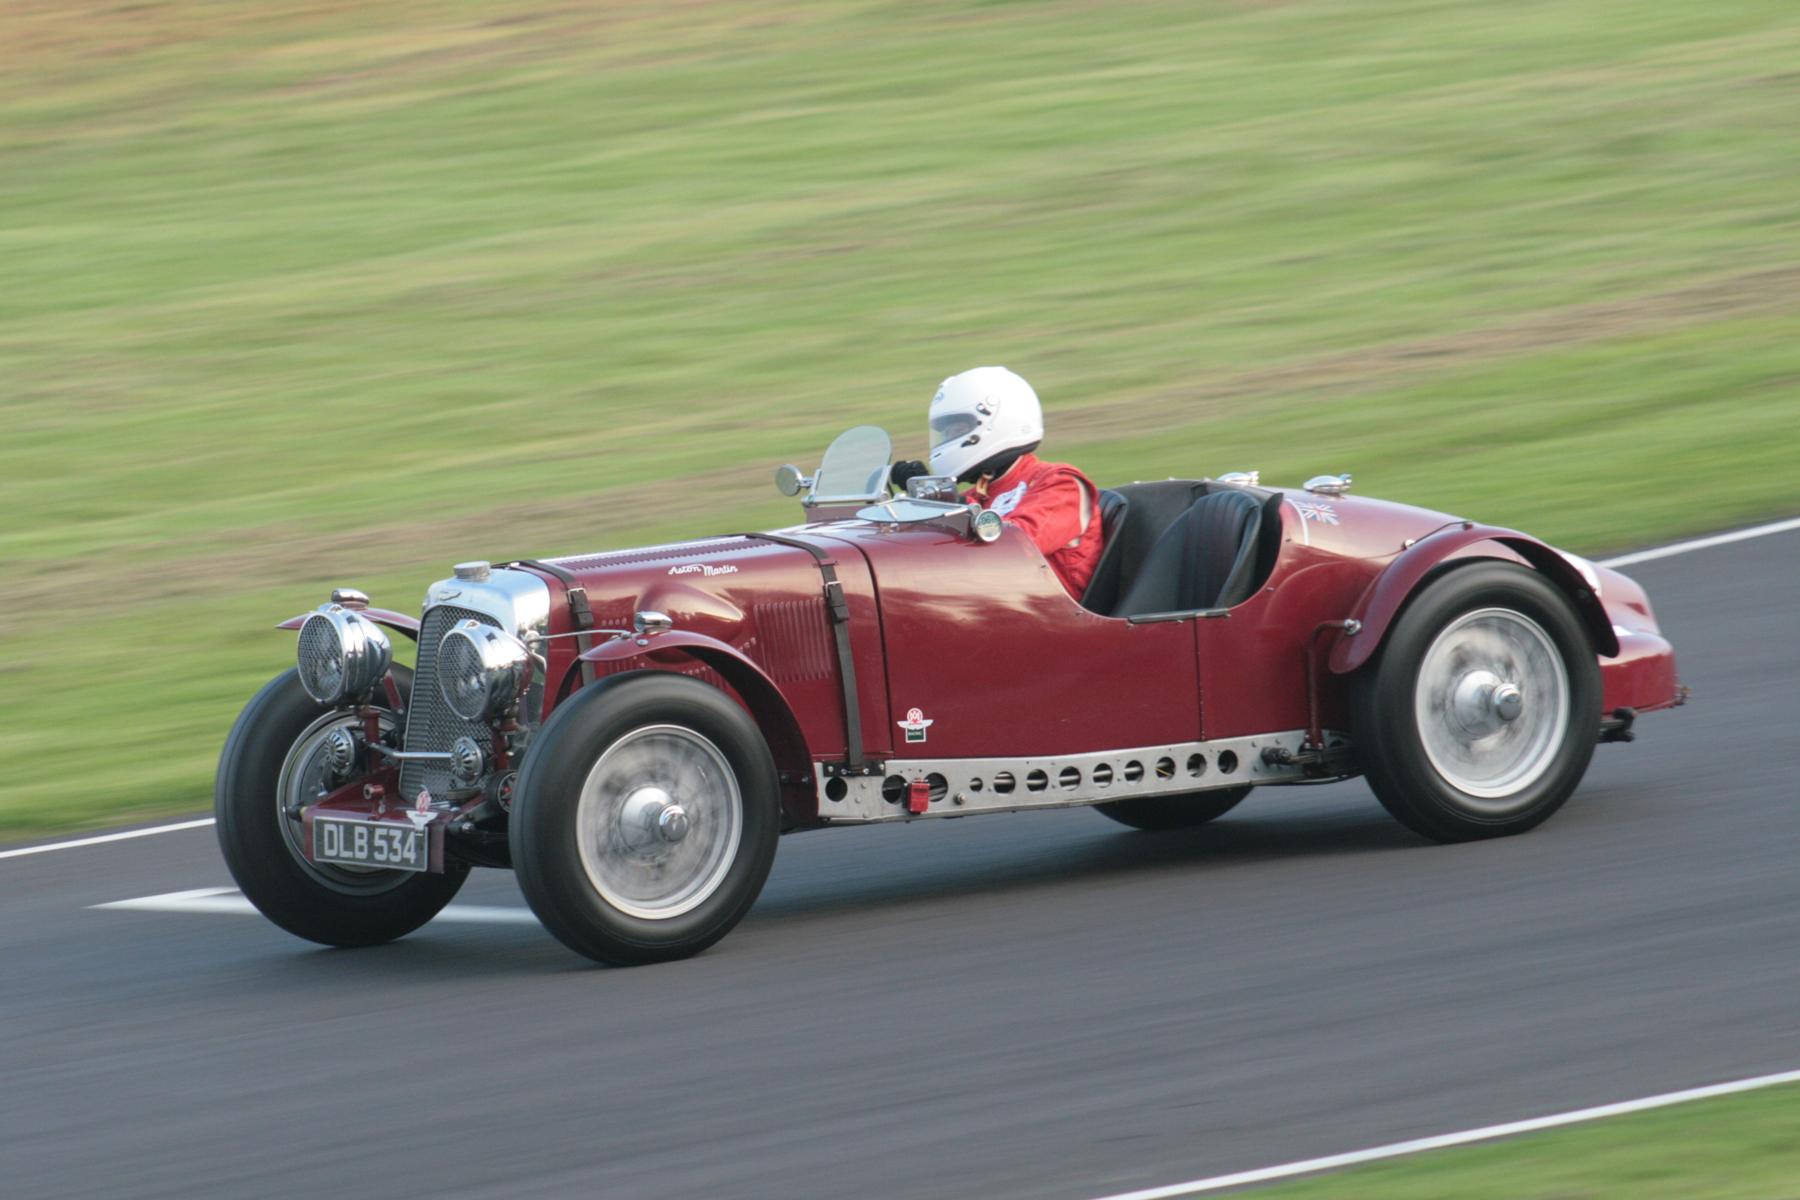 Robert Blakemore in his fabulous Aston Martin Speed Model. Photo - John Turner